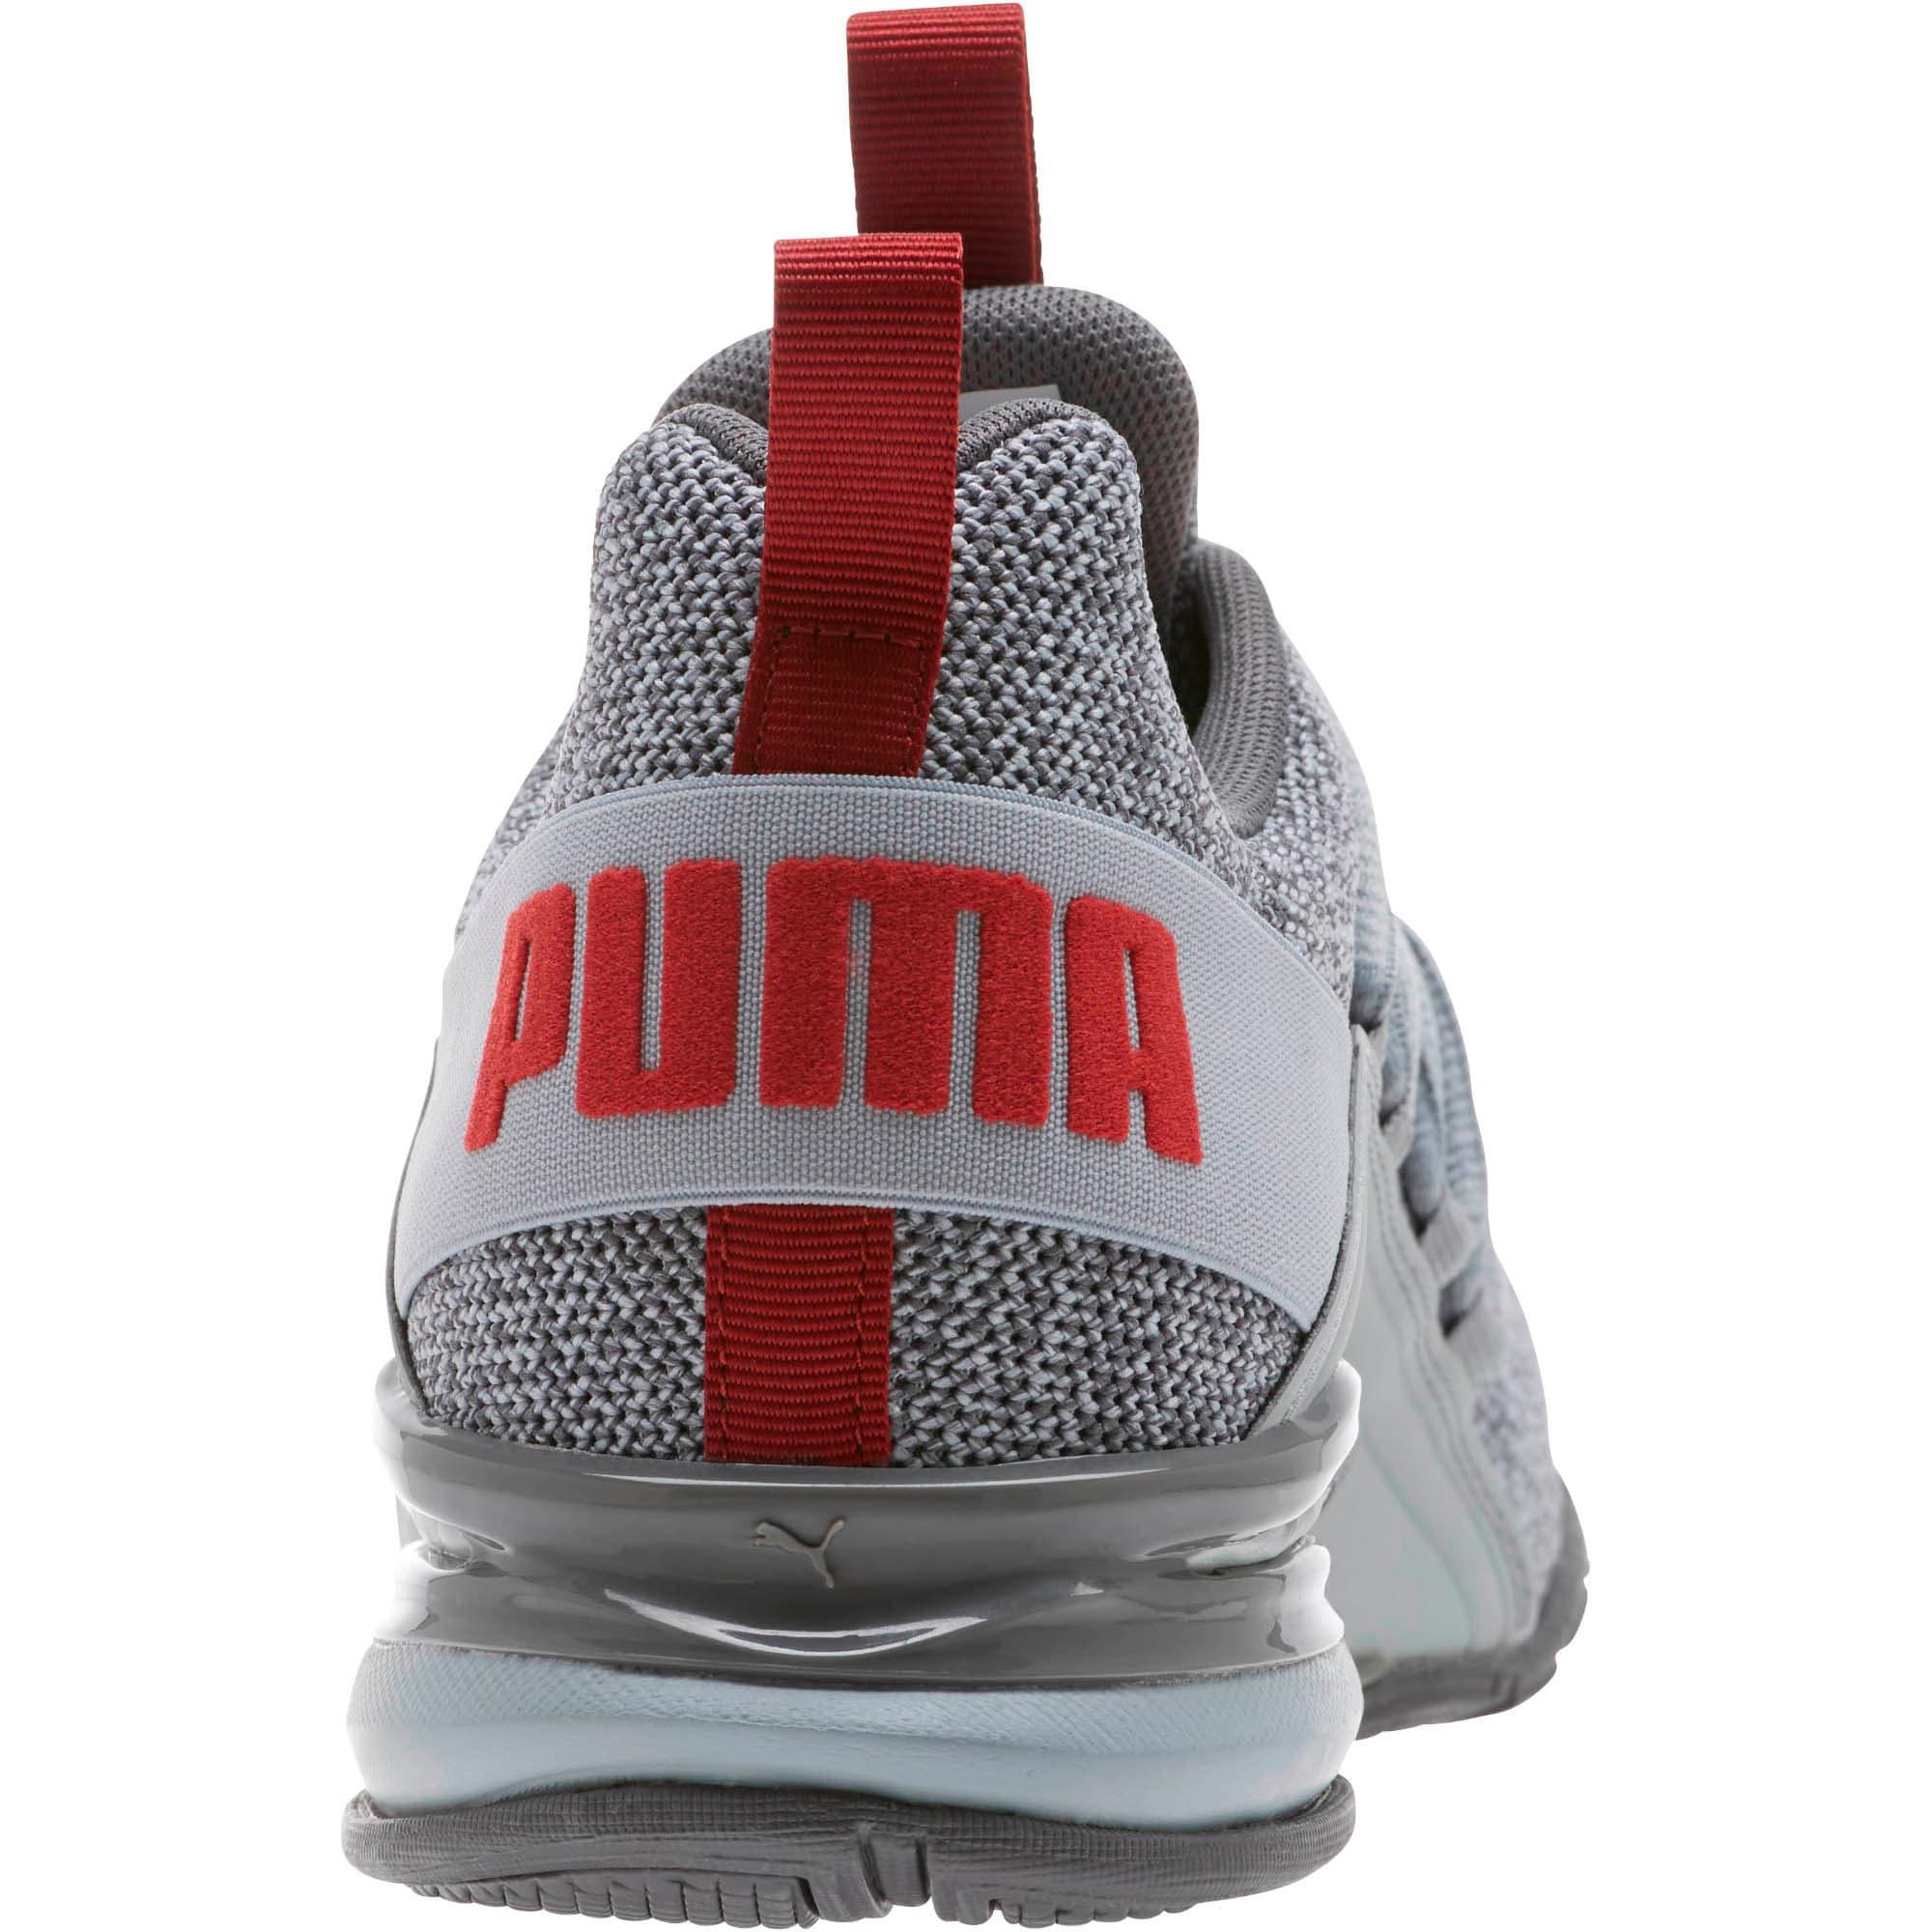 Thumbnail 4 of Axelion Men's Training Shoes, Quarry-QUIET SHADE-Red, medium